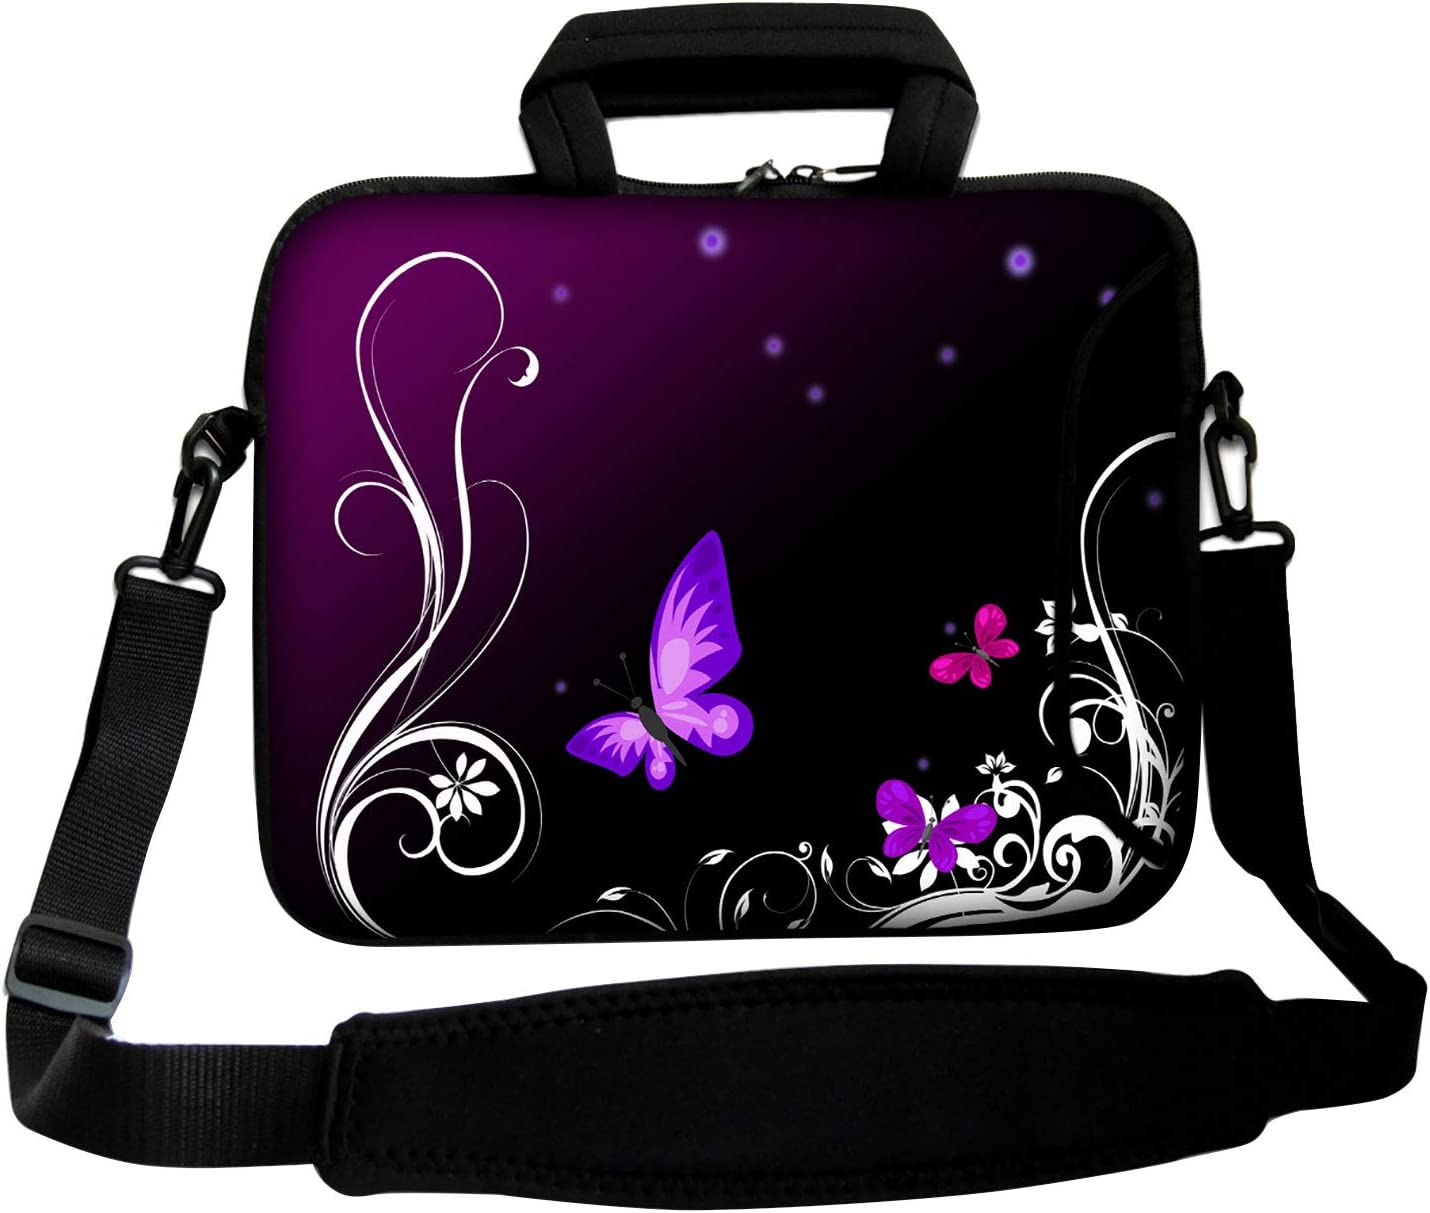 Laptop Shoulder Bag Women Neoprene Messenger Case for 16 17 17.3 17.4 inch Notbook PC (PURPLE)